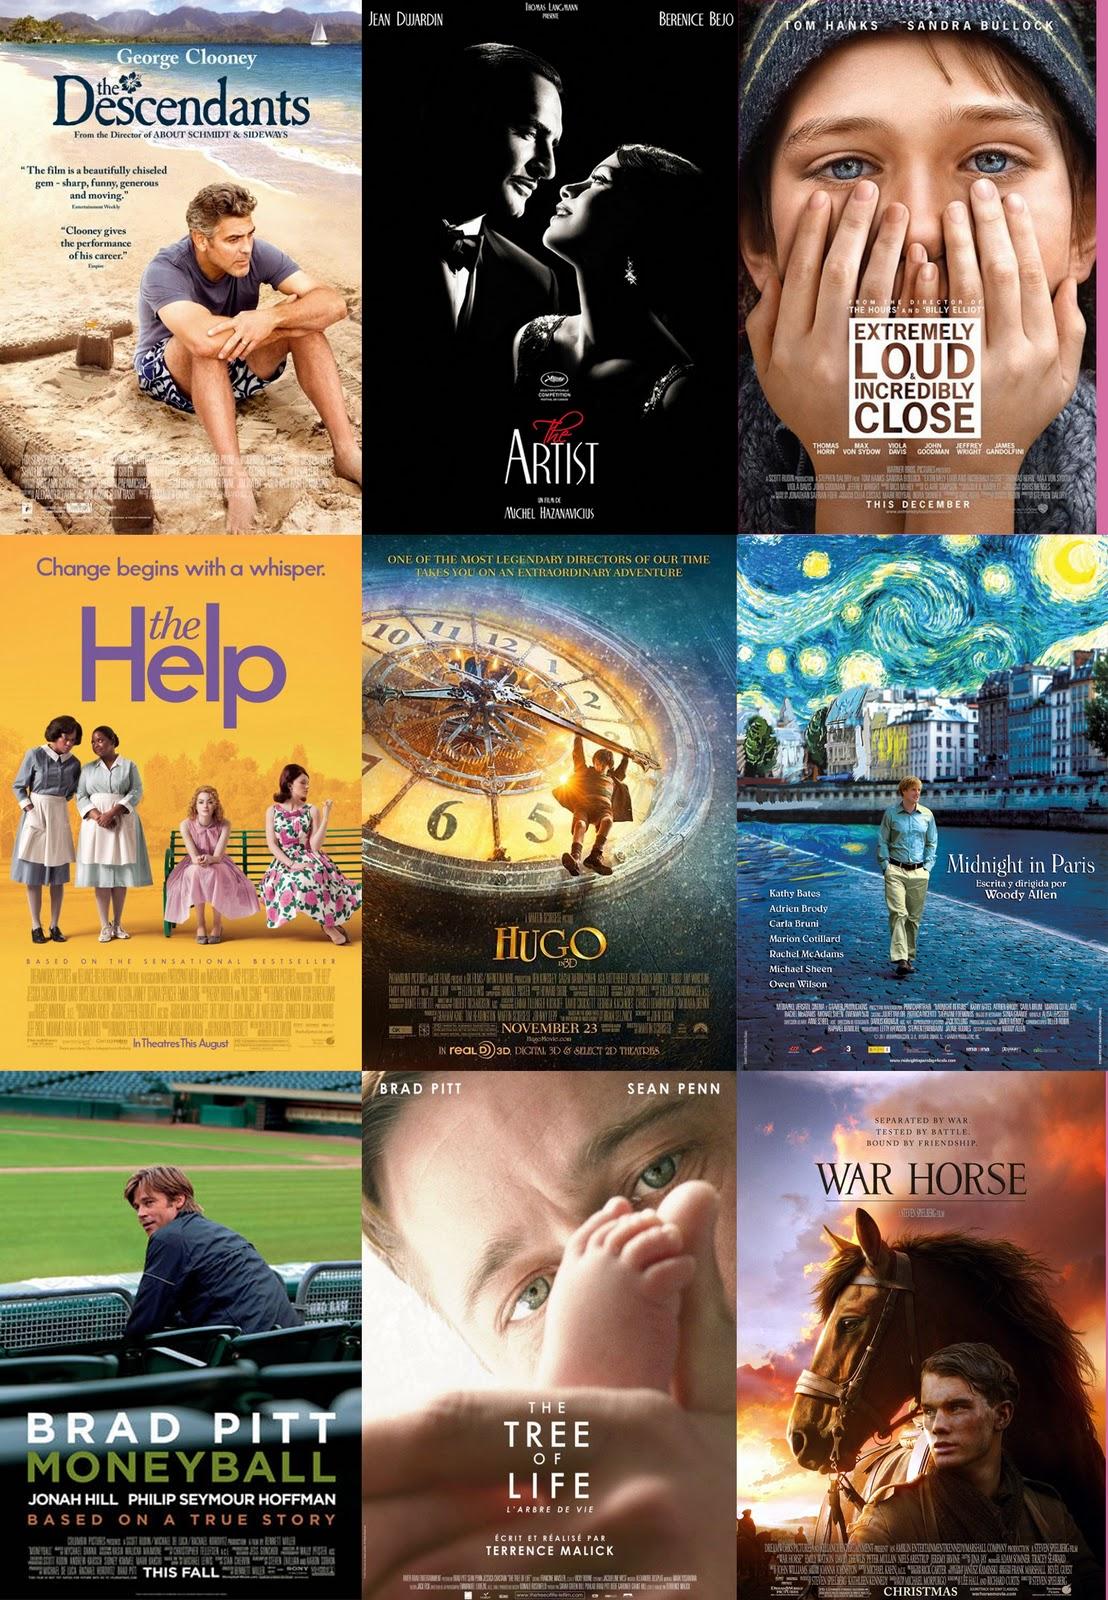 http://4.bp.blogspot.com/-PJoVg4SXIvc/Tx7KfD5YV1I/AAAAAAAAIGo/HH-rY-fEKEc/s1600/oscar+nominations+films+2012+copy.jpg